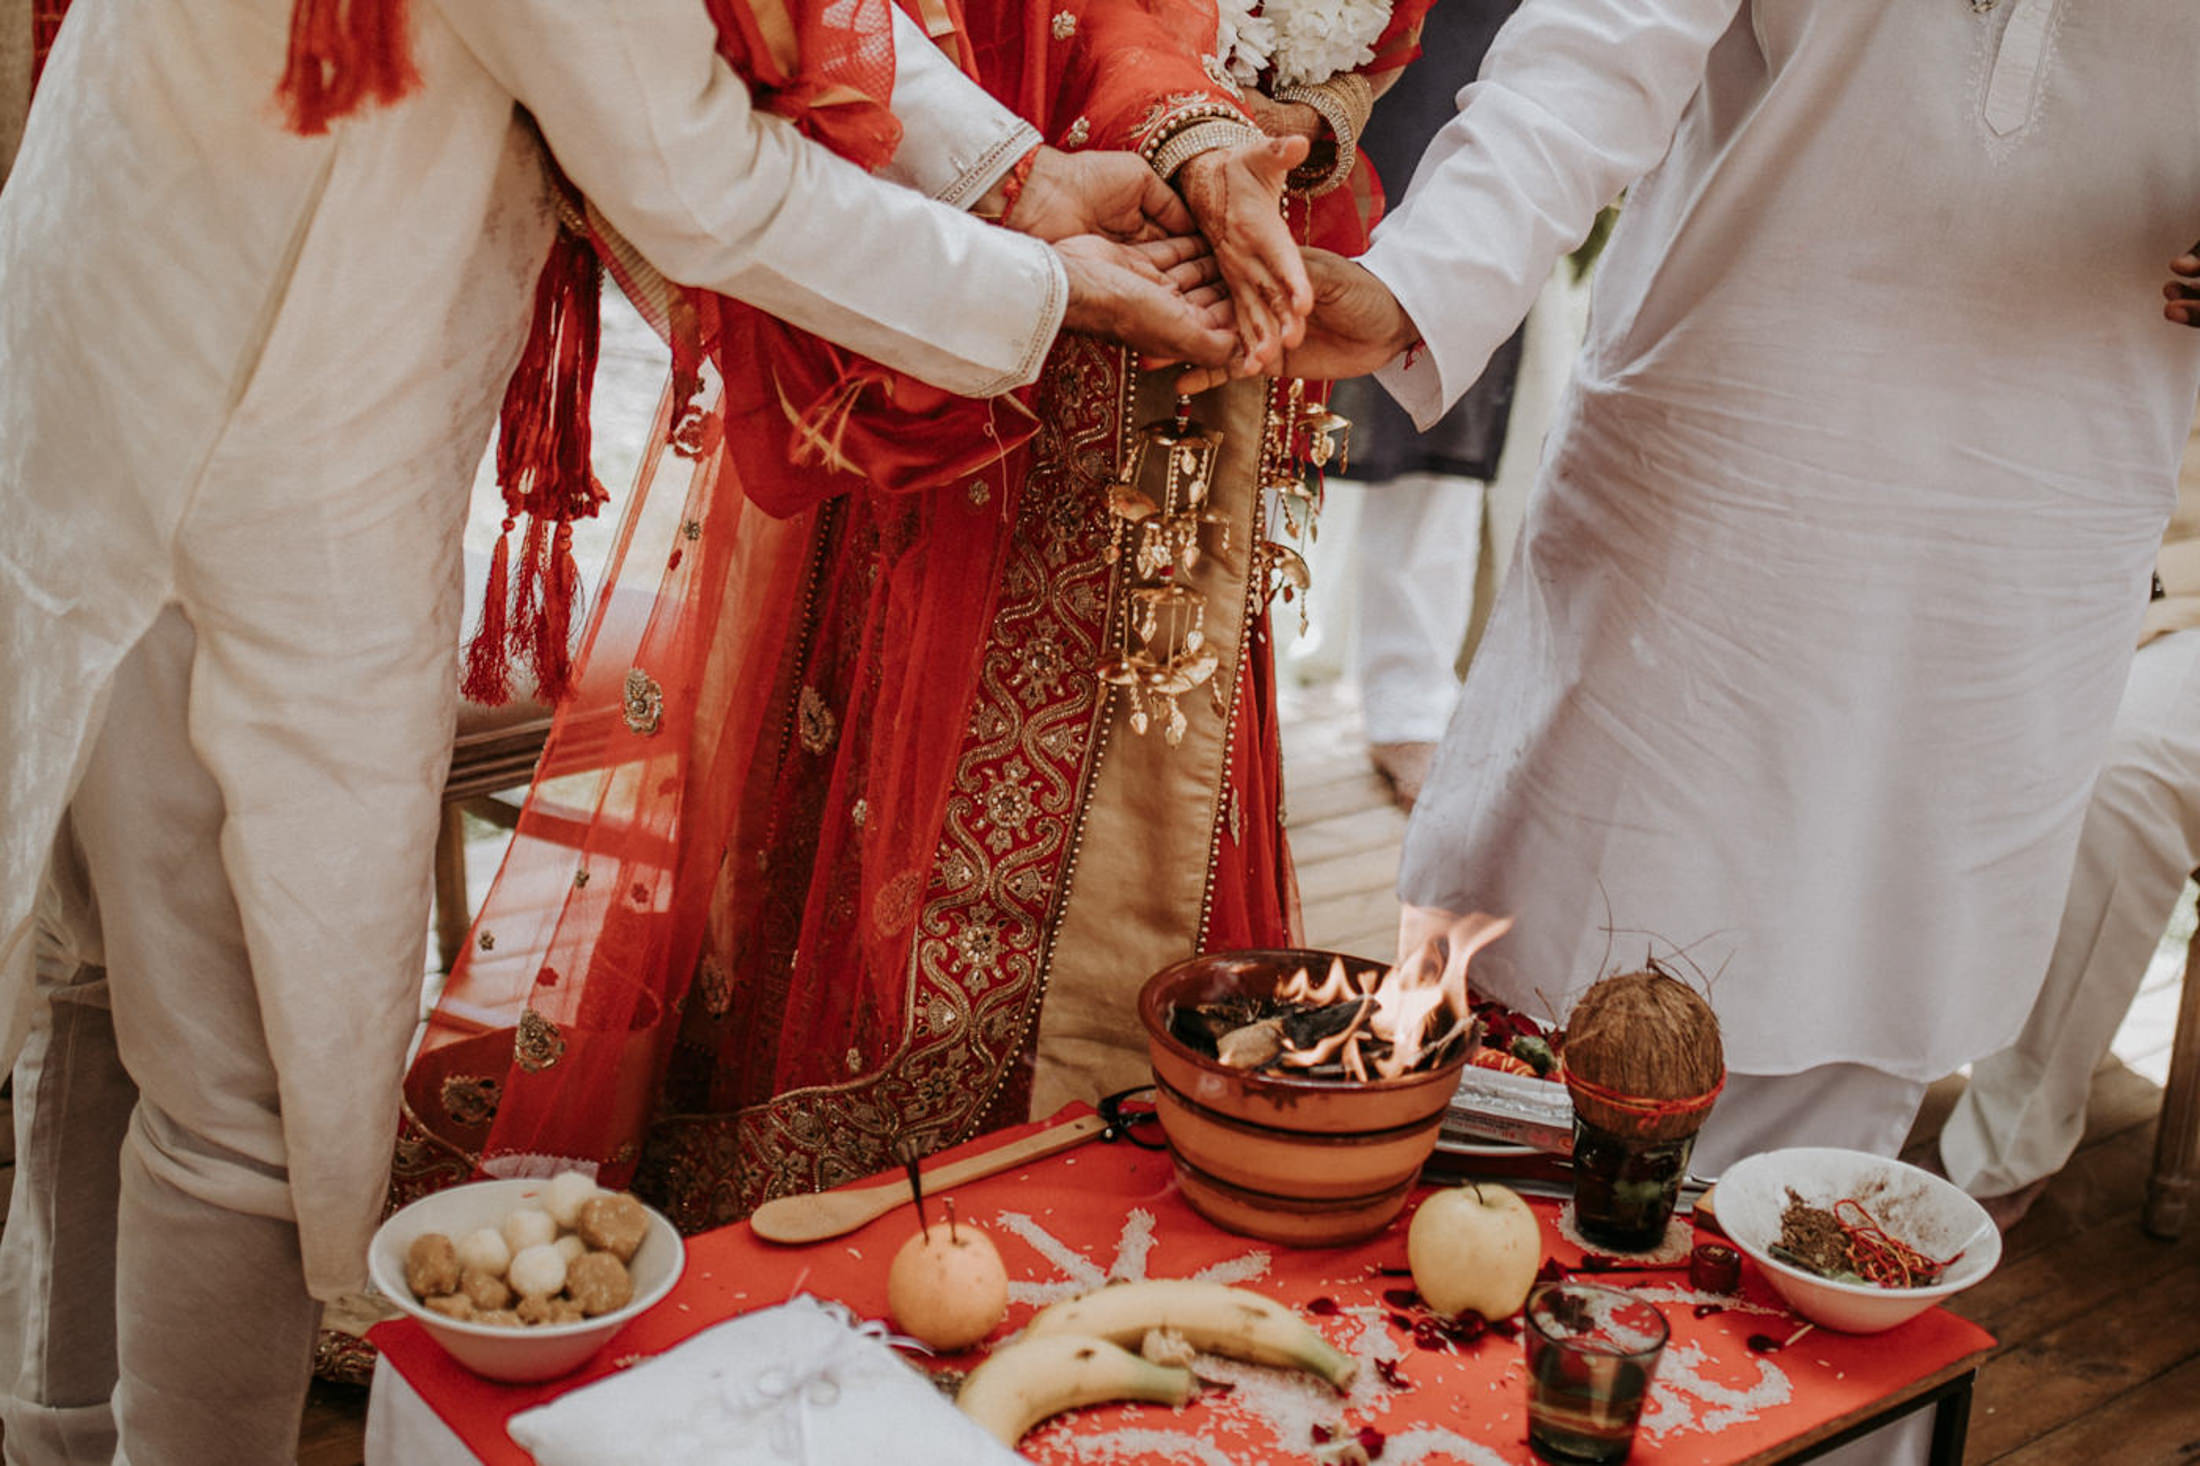 Wedding_Photographer_Mallorca_Daniela-Marquardt_Photography_New_York_Iceland_Tuscany_Santorini_Portugal_Austria_Bavaria_Elopement_Hochzeitsfotograf_AntjeRajat2_49